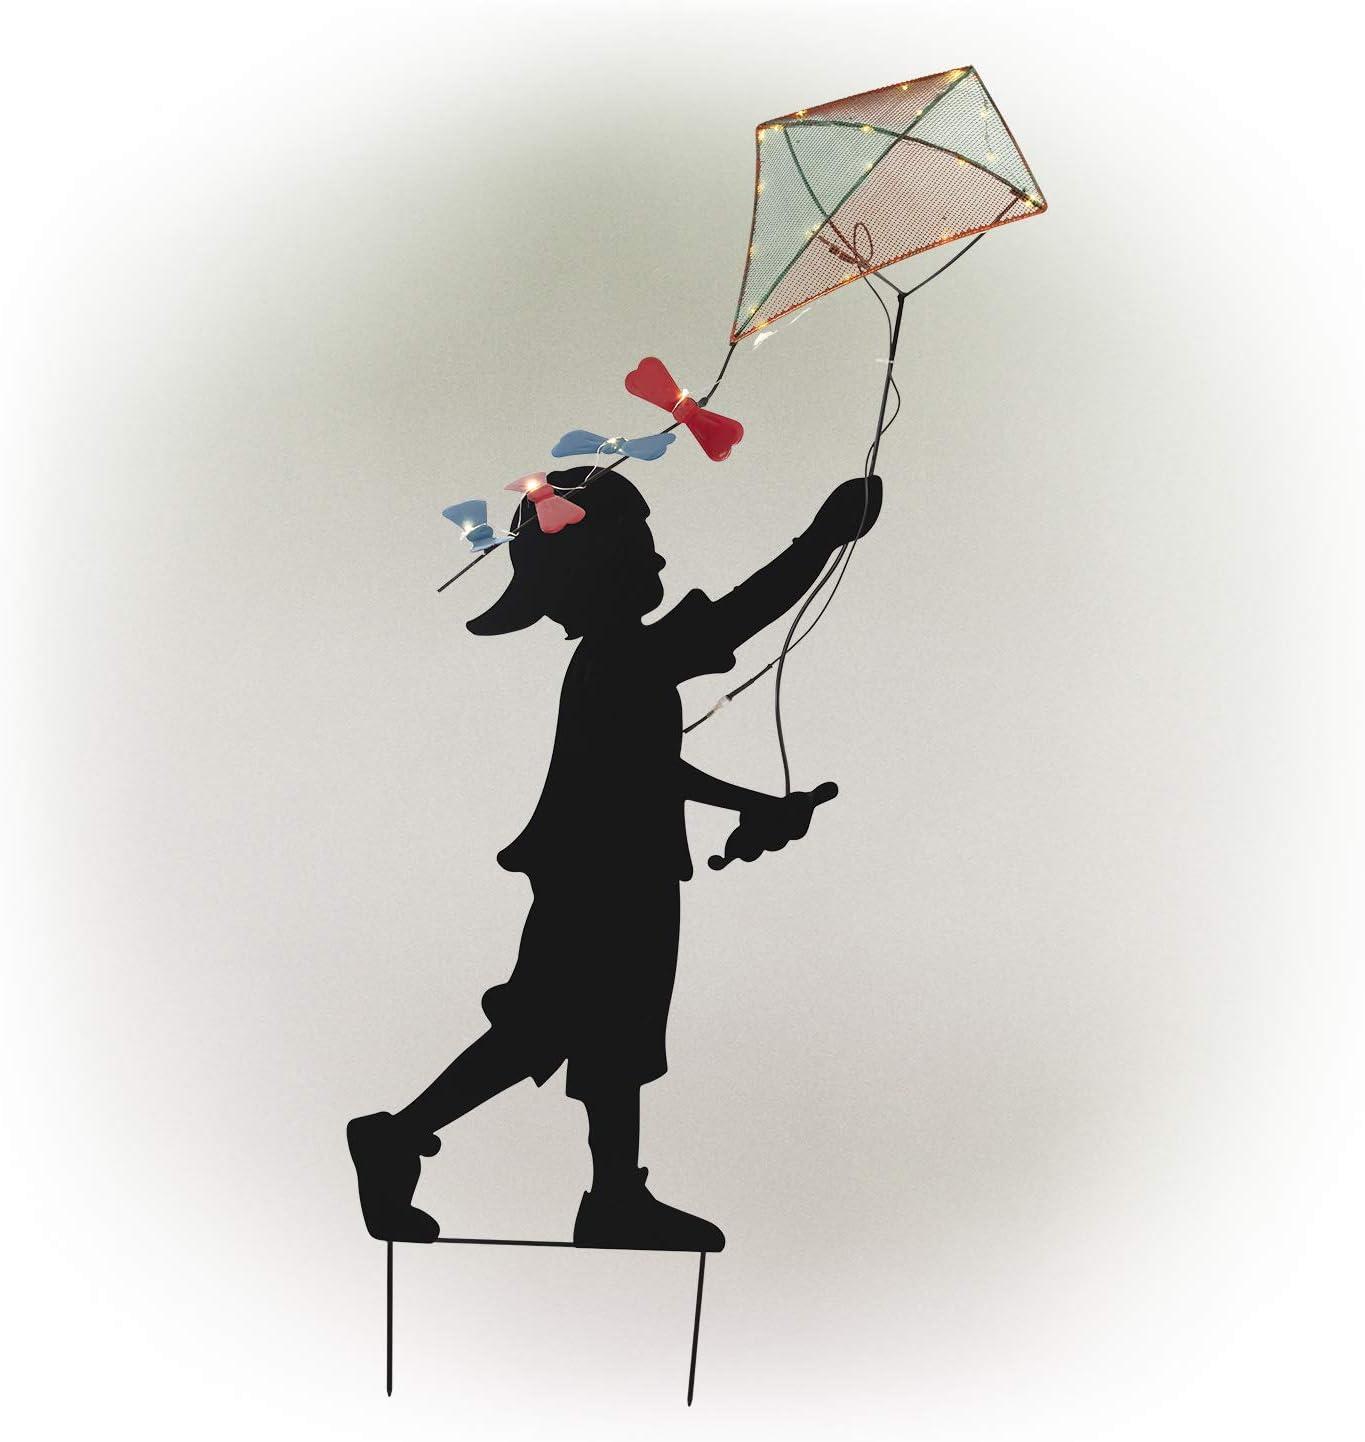 Amazon Com Alpine Corporation Solar Boy Silhouette Flying Kite Decor With Led Lights Outdoor Yard Art Decor 33 X 9 X 41 Garden Outdoor 4,000+ vectors, stock photos & psd files. alpine corporation solar boy silhouette flying kite decor with led lights outdoor yard art decor 33 x 9 x 41